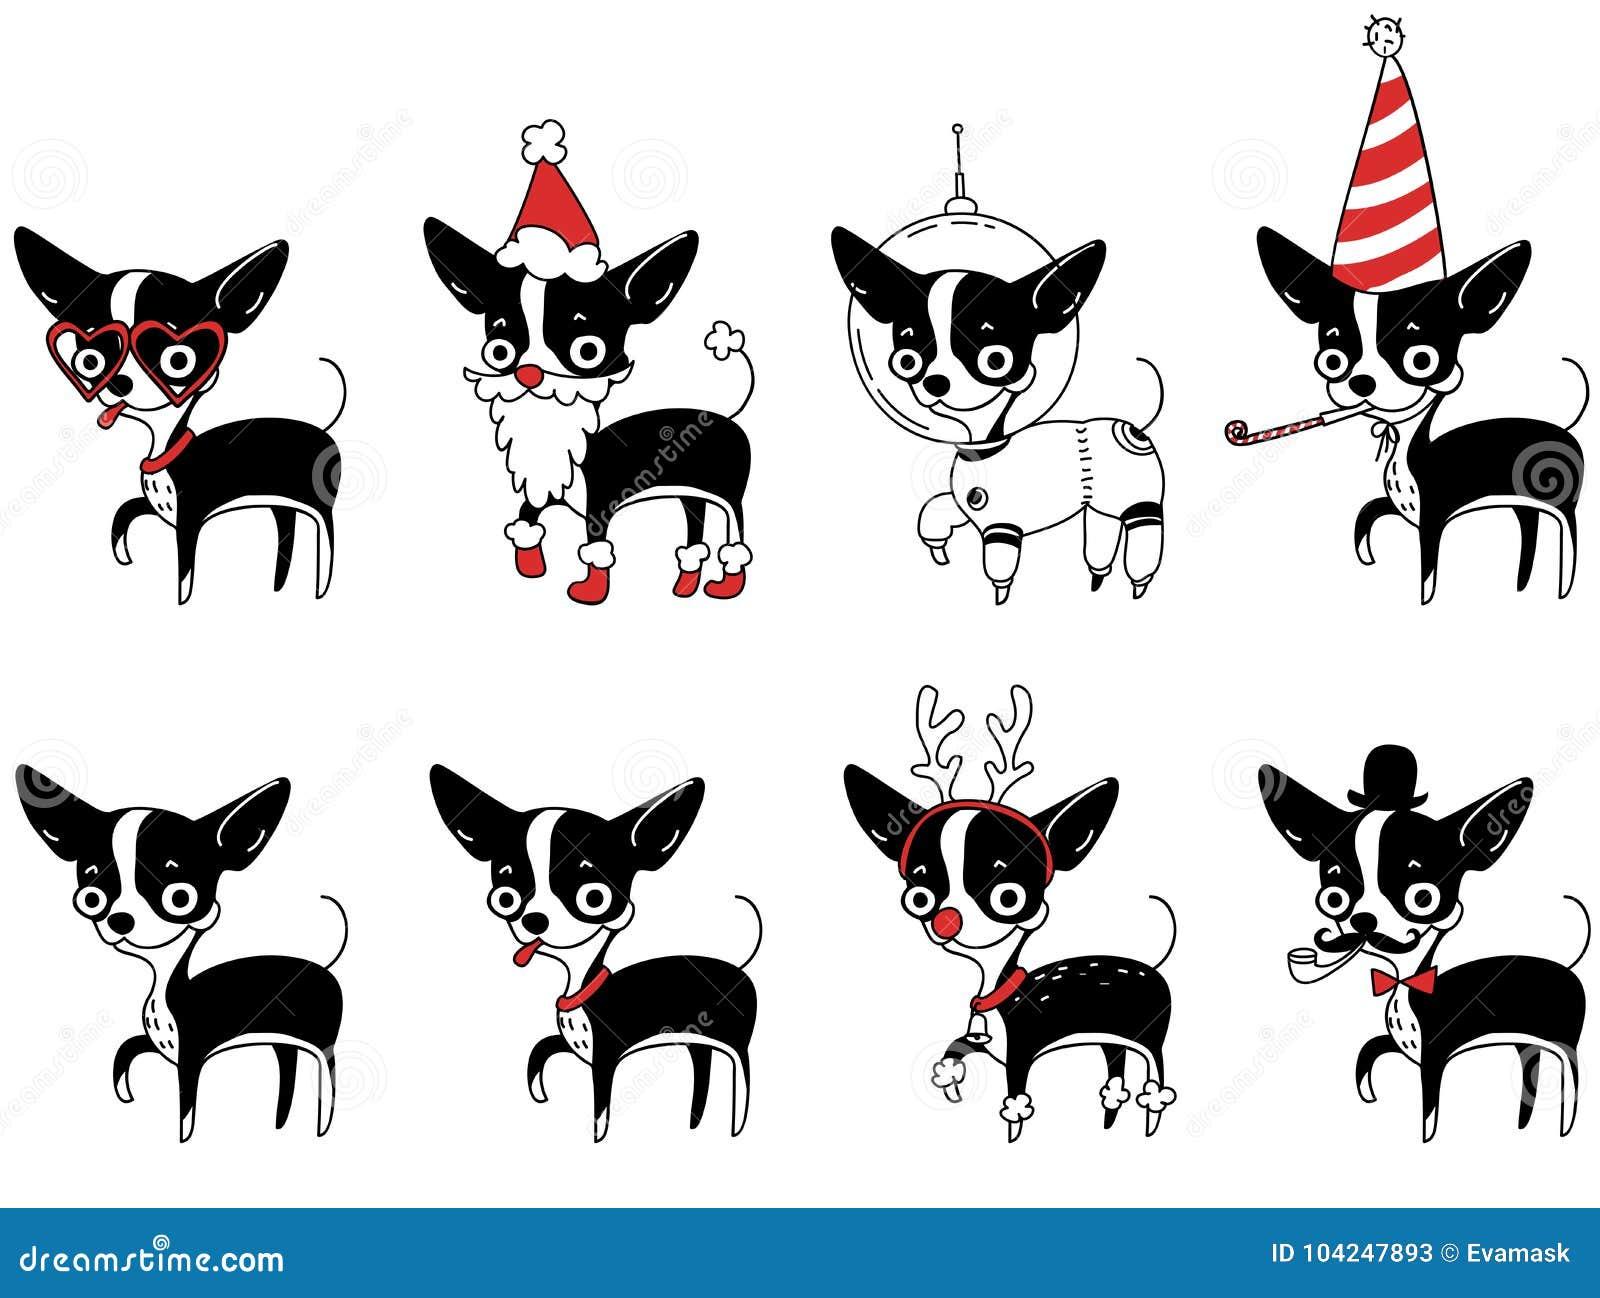 Dibujo De Chihuahua: Un Sistema De Dibujos Con Un Perro De La Chihuahua